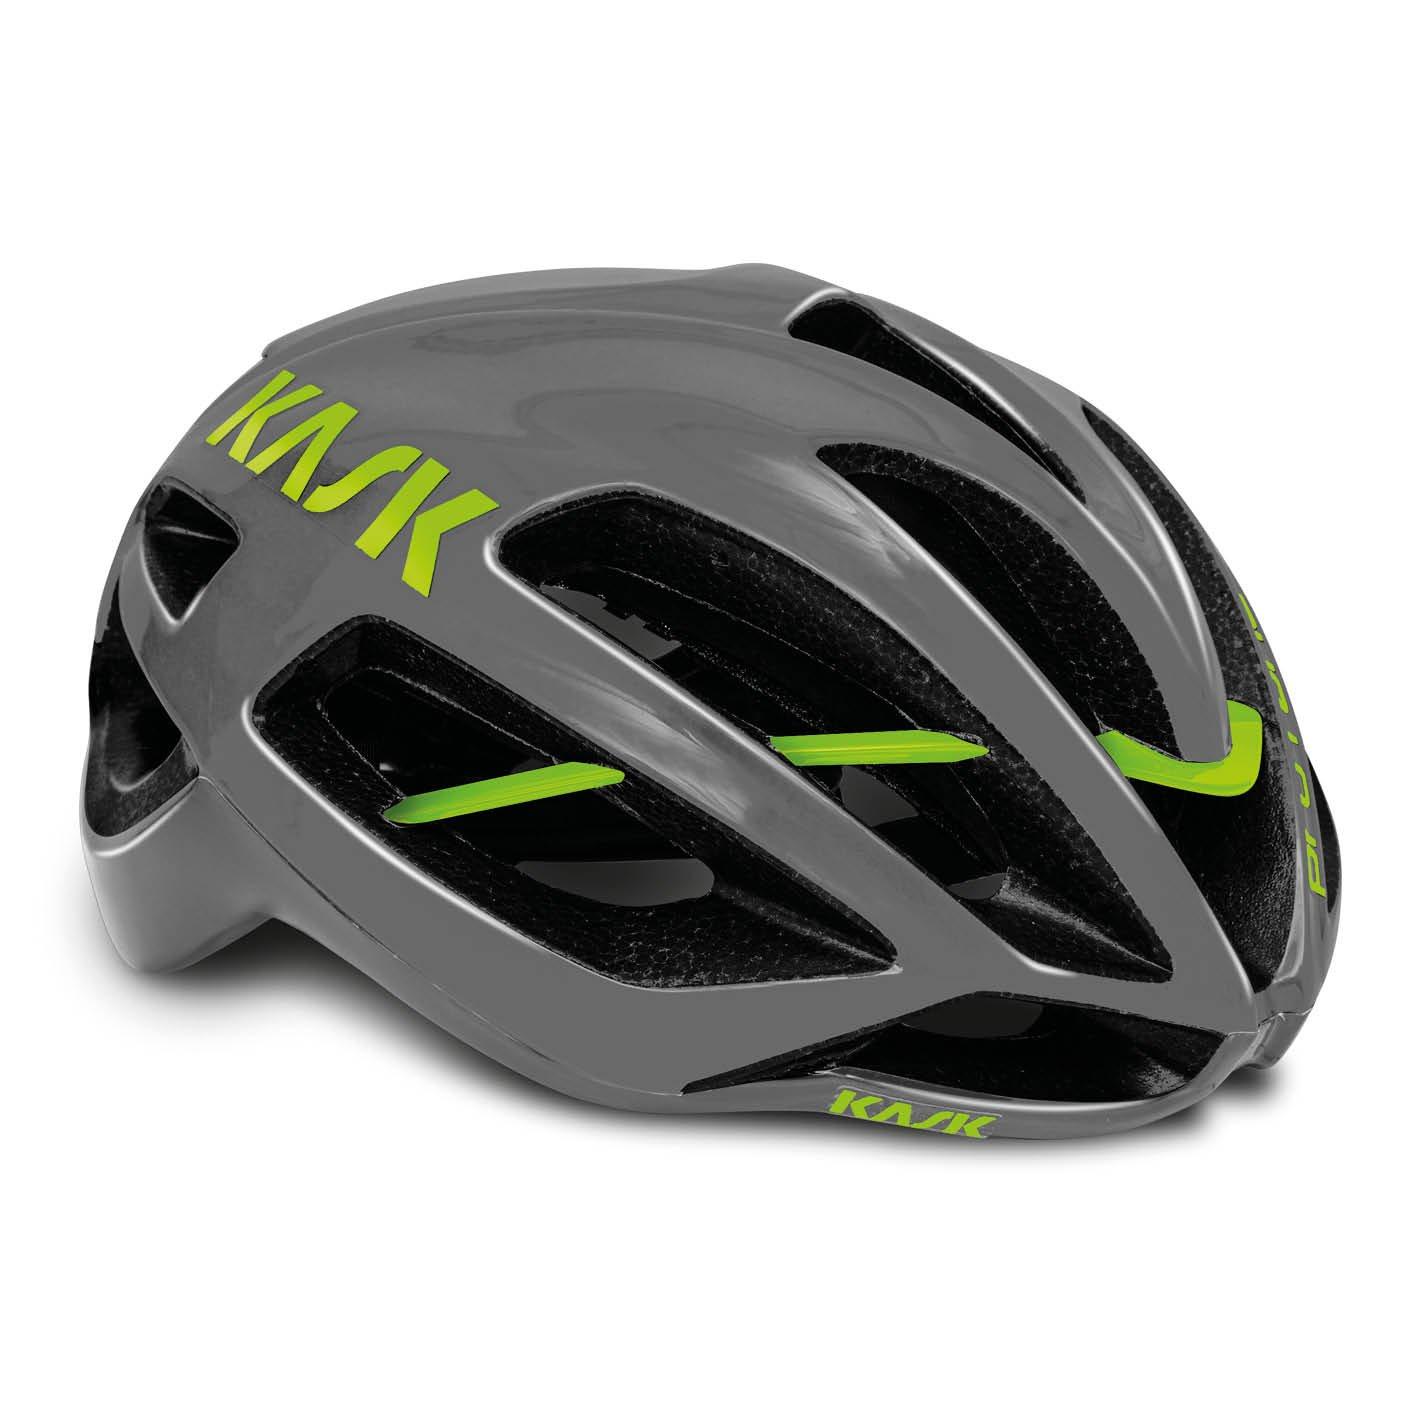 Kask Protone Limited Edition Helmet